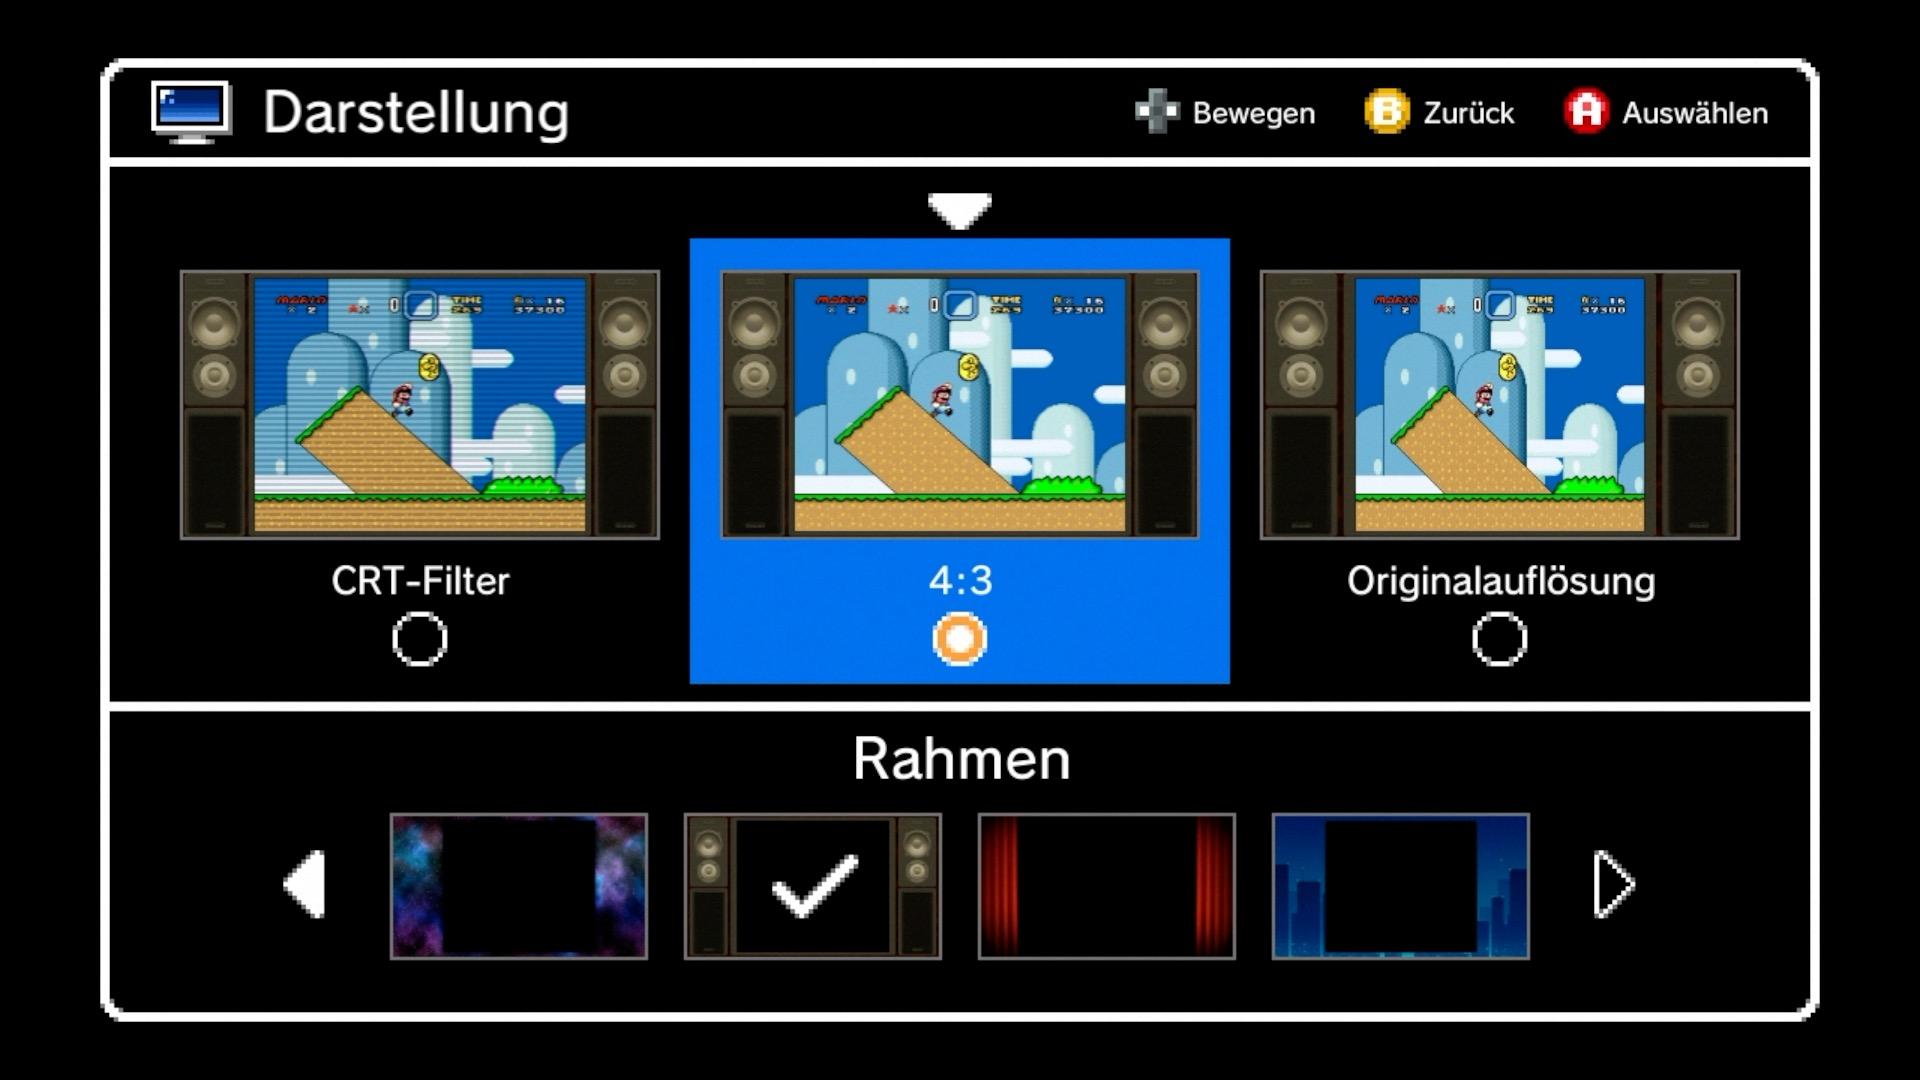 SNES Classic Mini im Vergleichstest: Putzige Retro-Konsole mit suboptimaler Emulation -